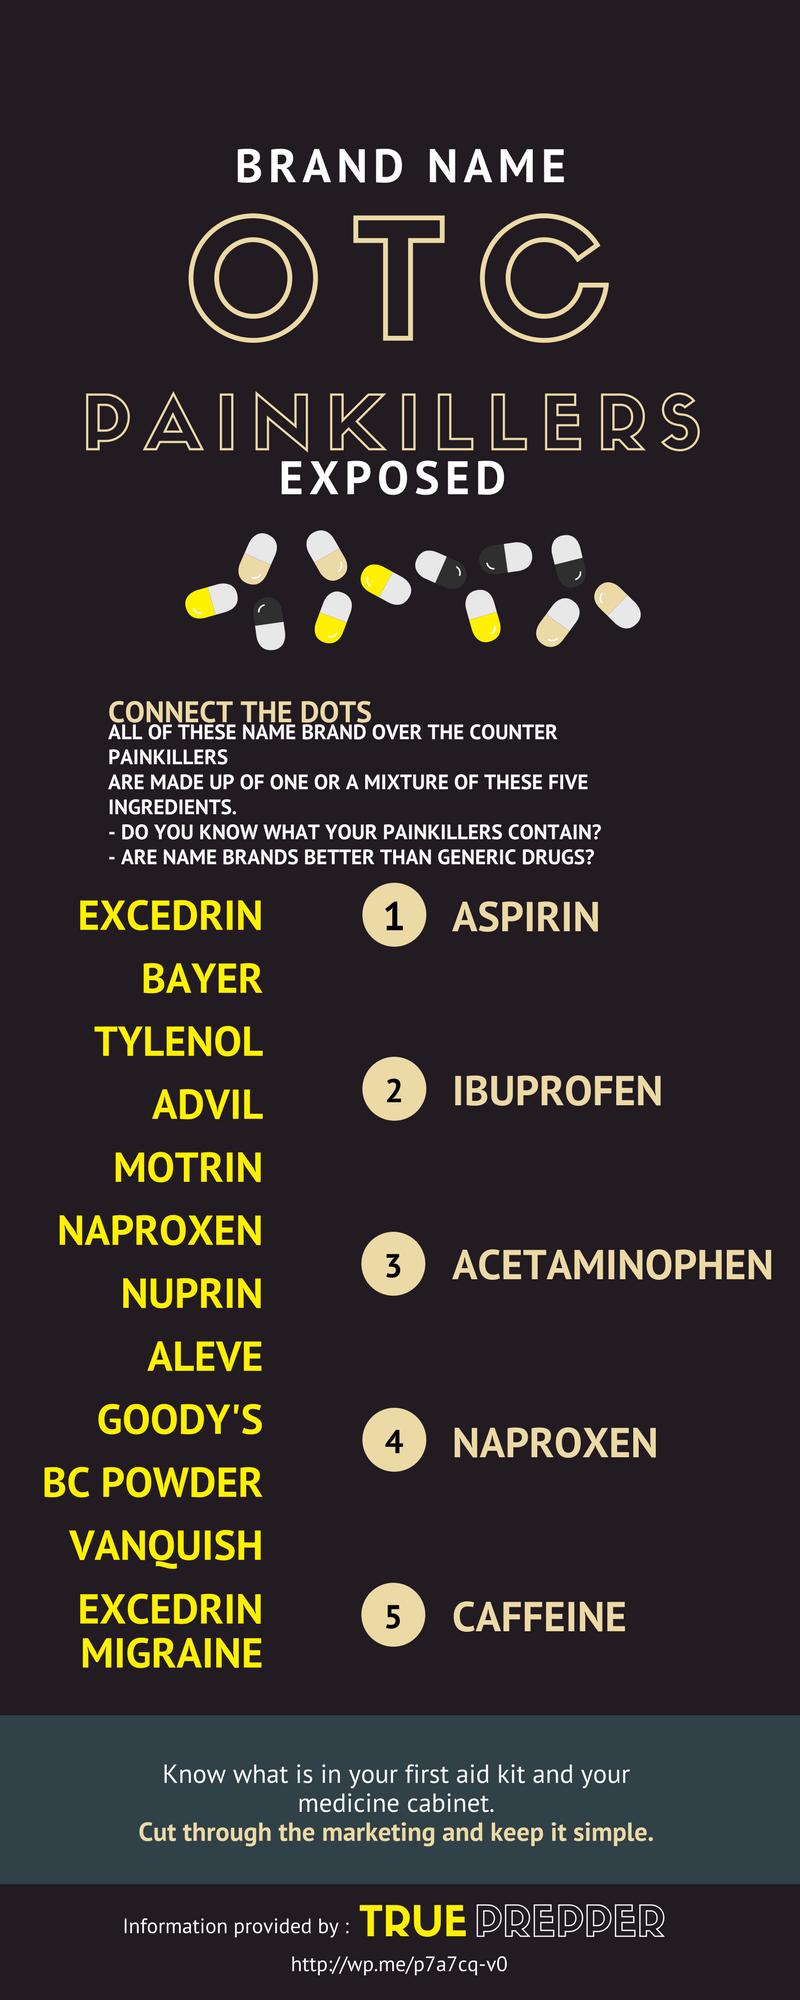 Brand Name OTC Painkillers Exposed